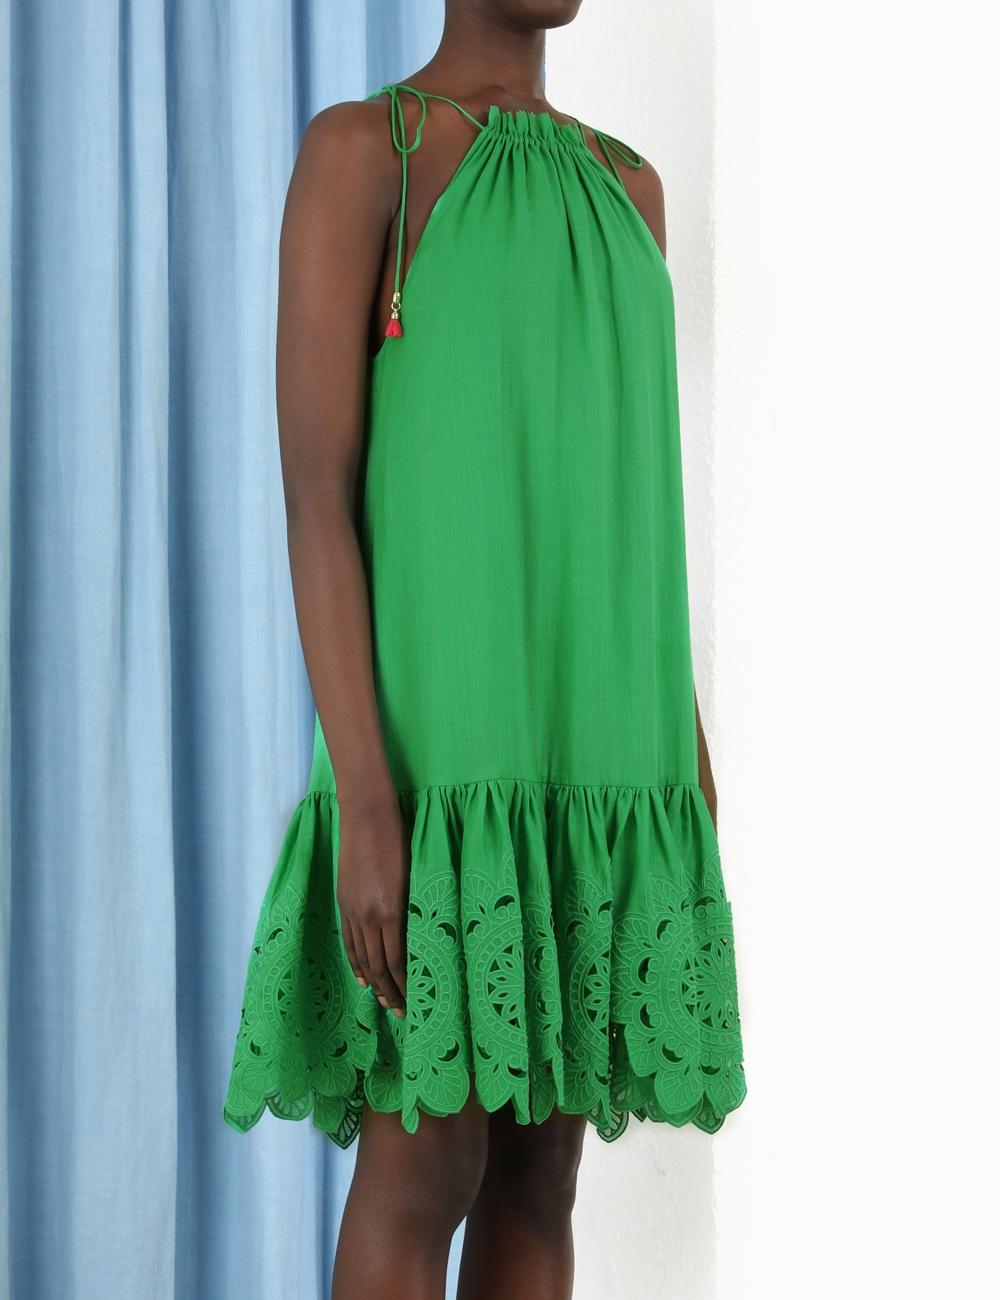 Teddy Scallop Mini Dress